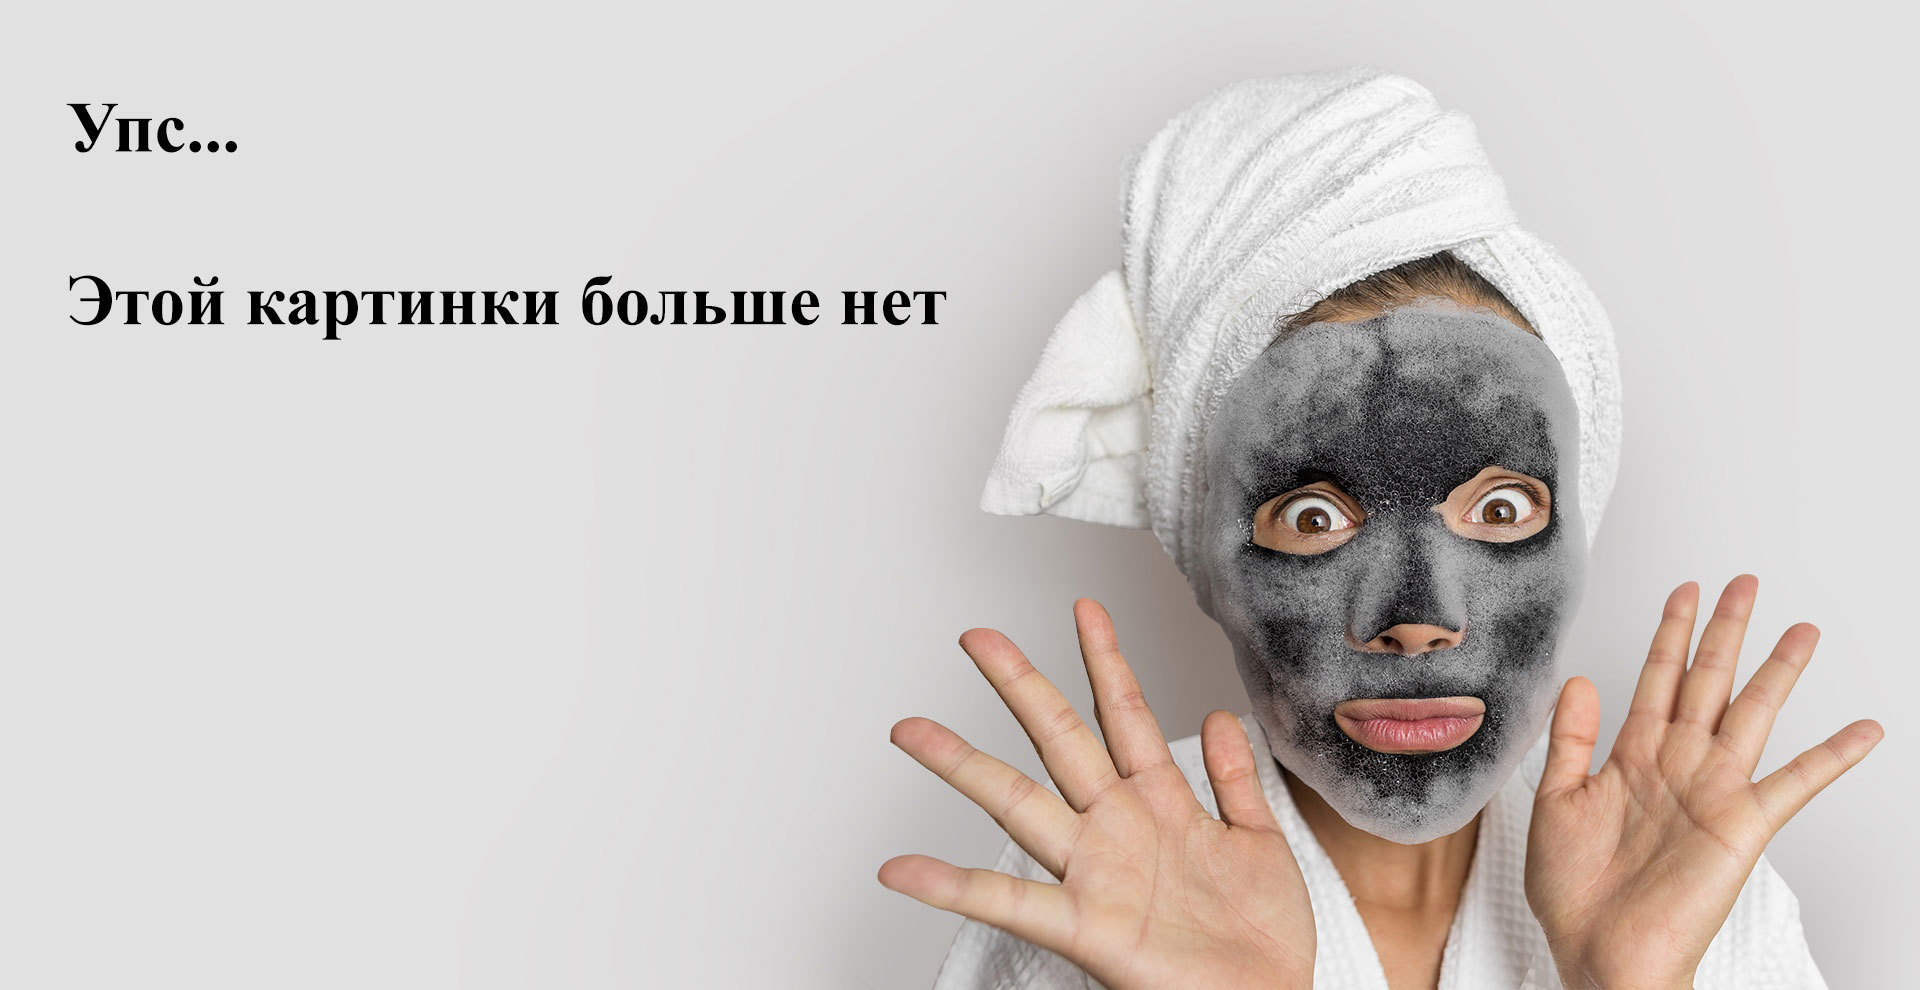 TNL, Бальзам для волос Daily Care «Витаминный коктейль», 1000 мл